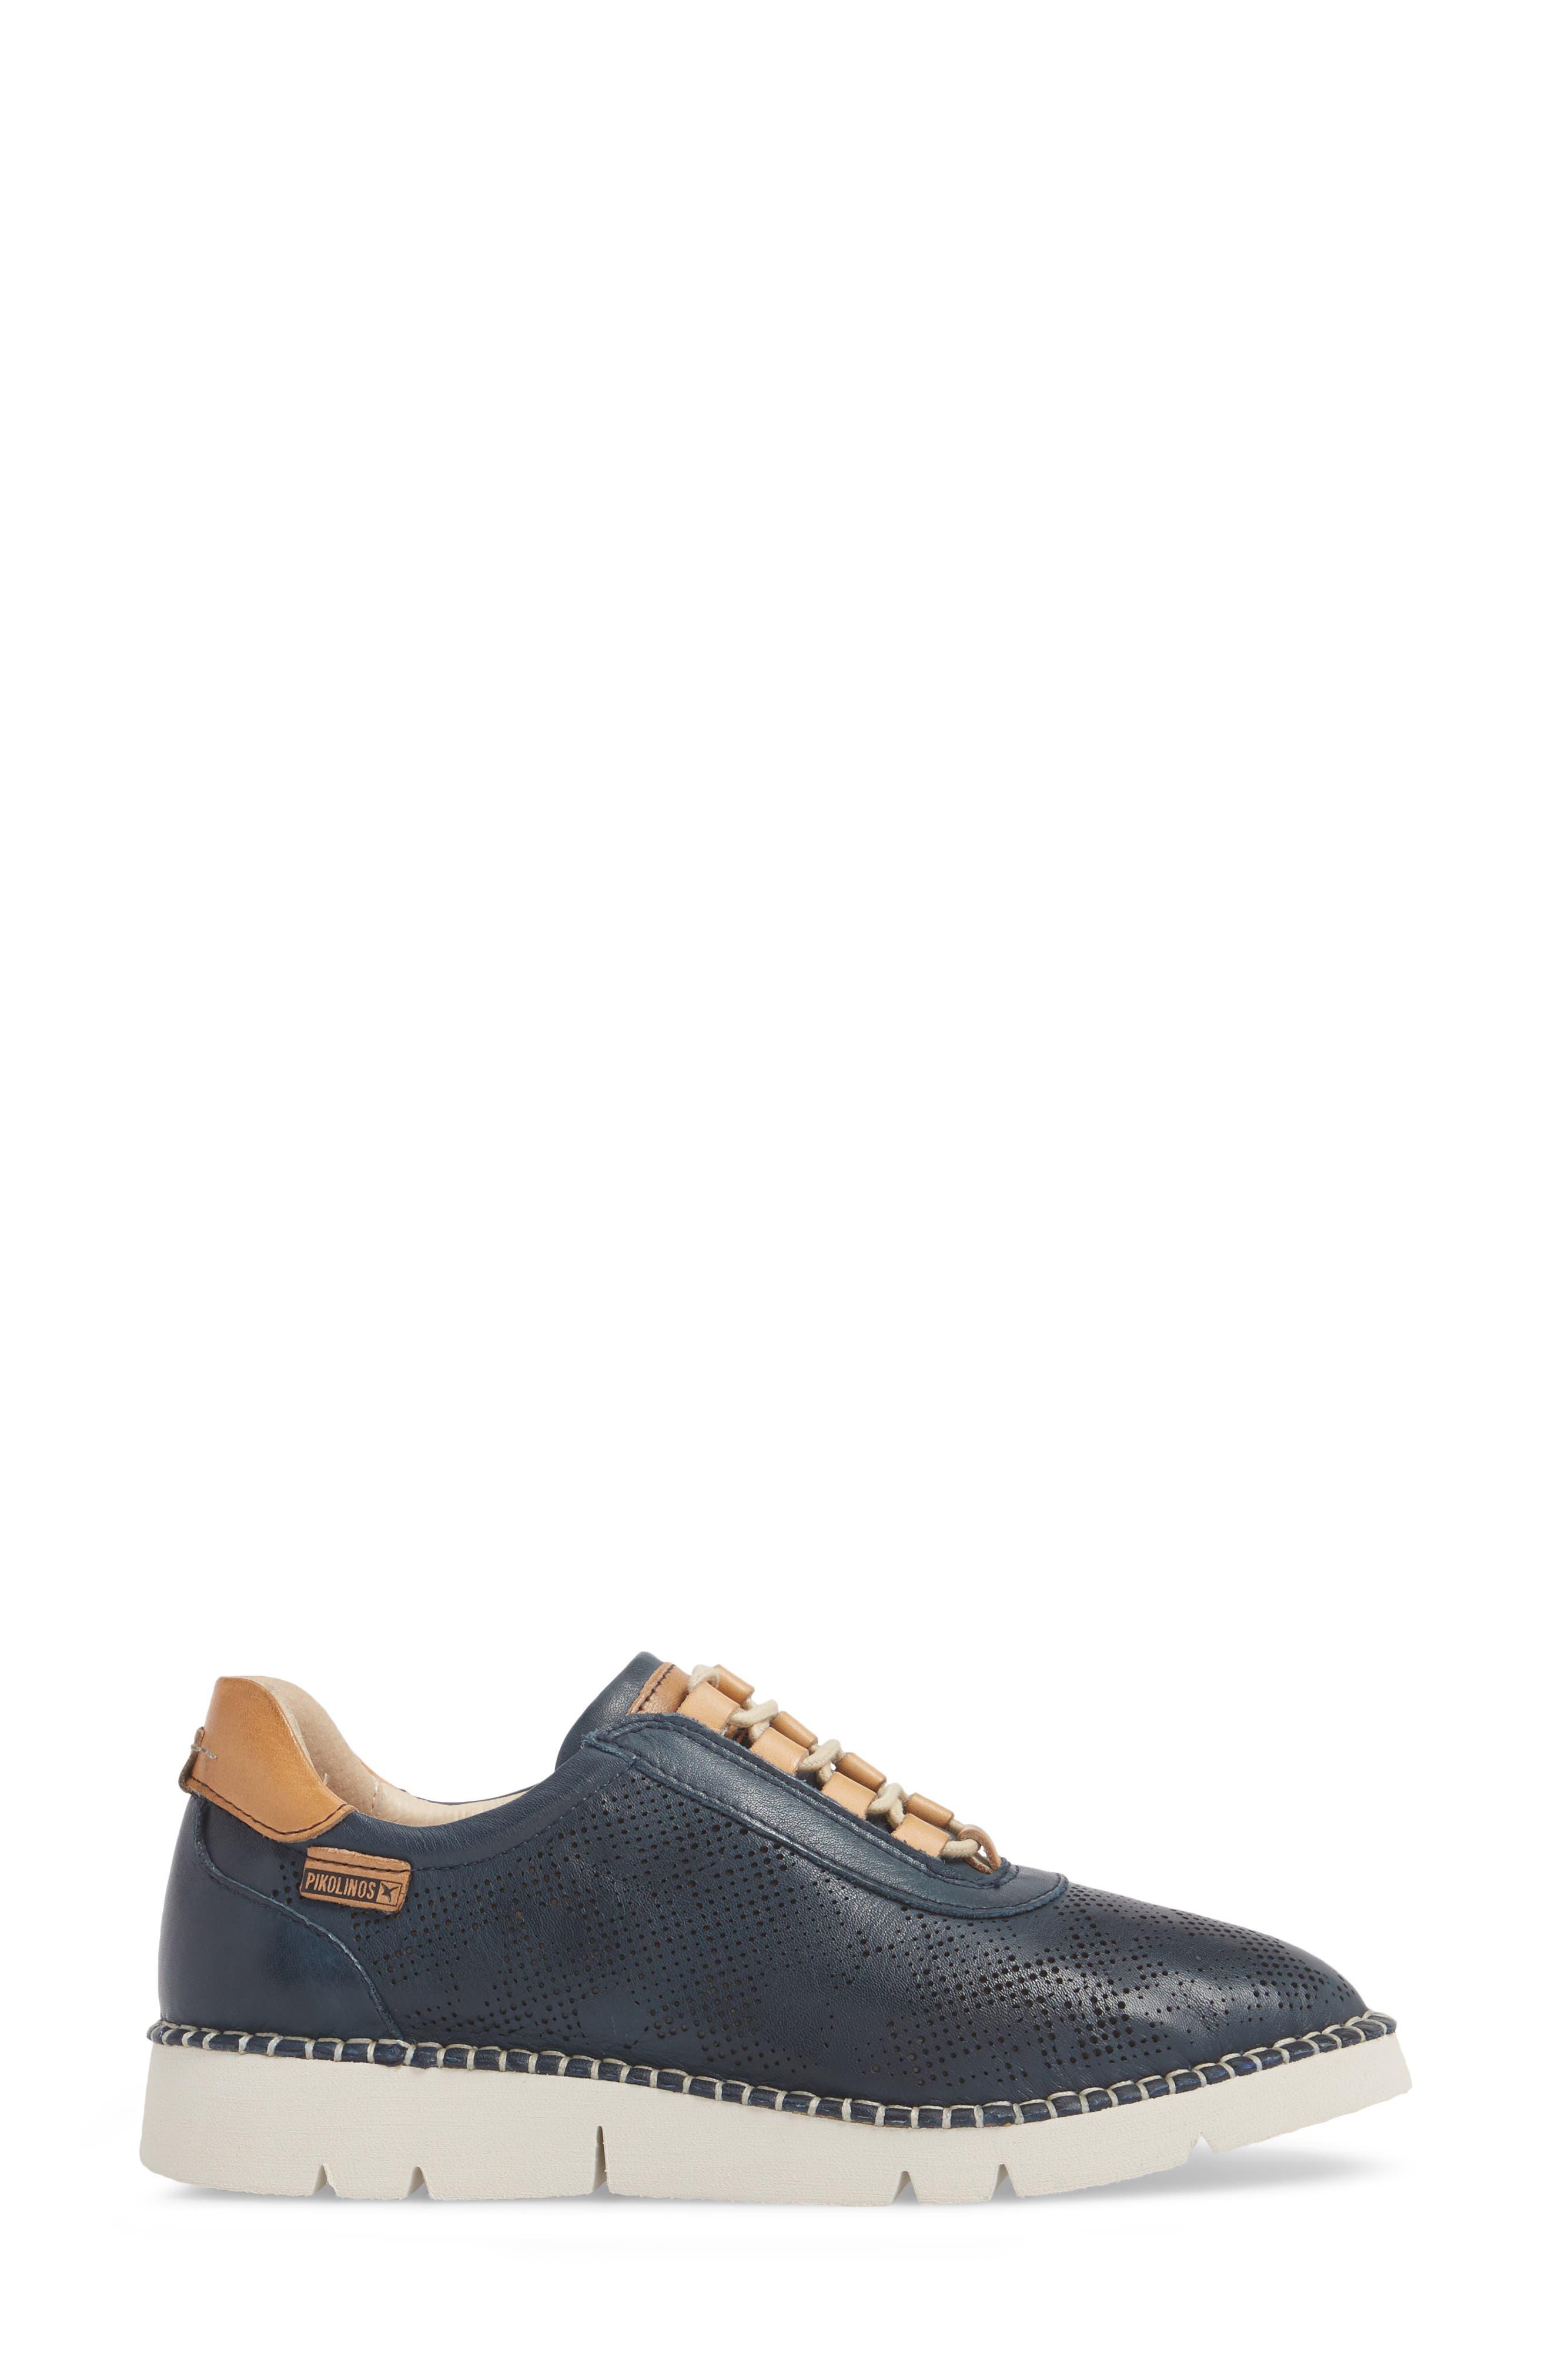 Vera Sneaker,                             Alternate thumbnail 3, color,                             OCEAN LEATHER